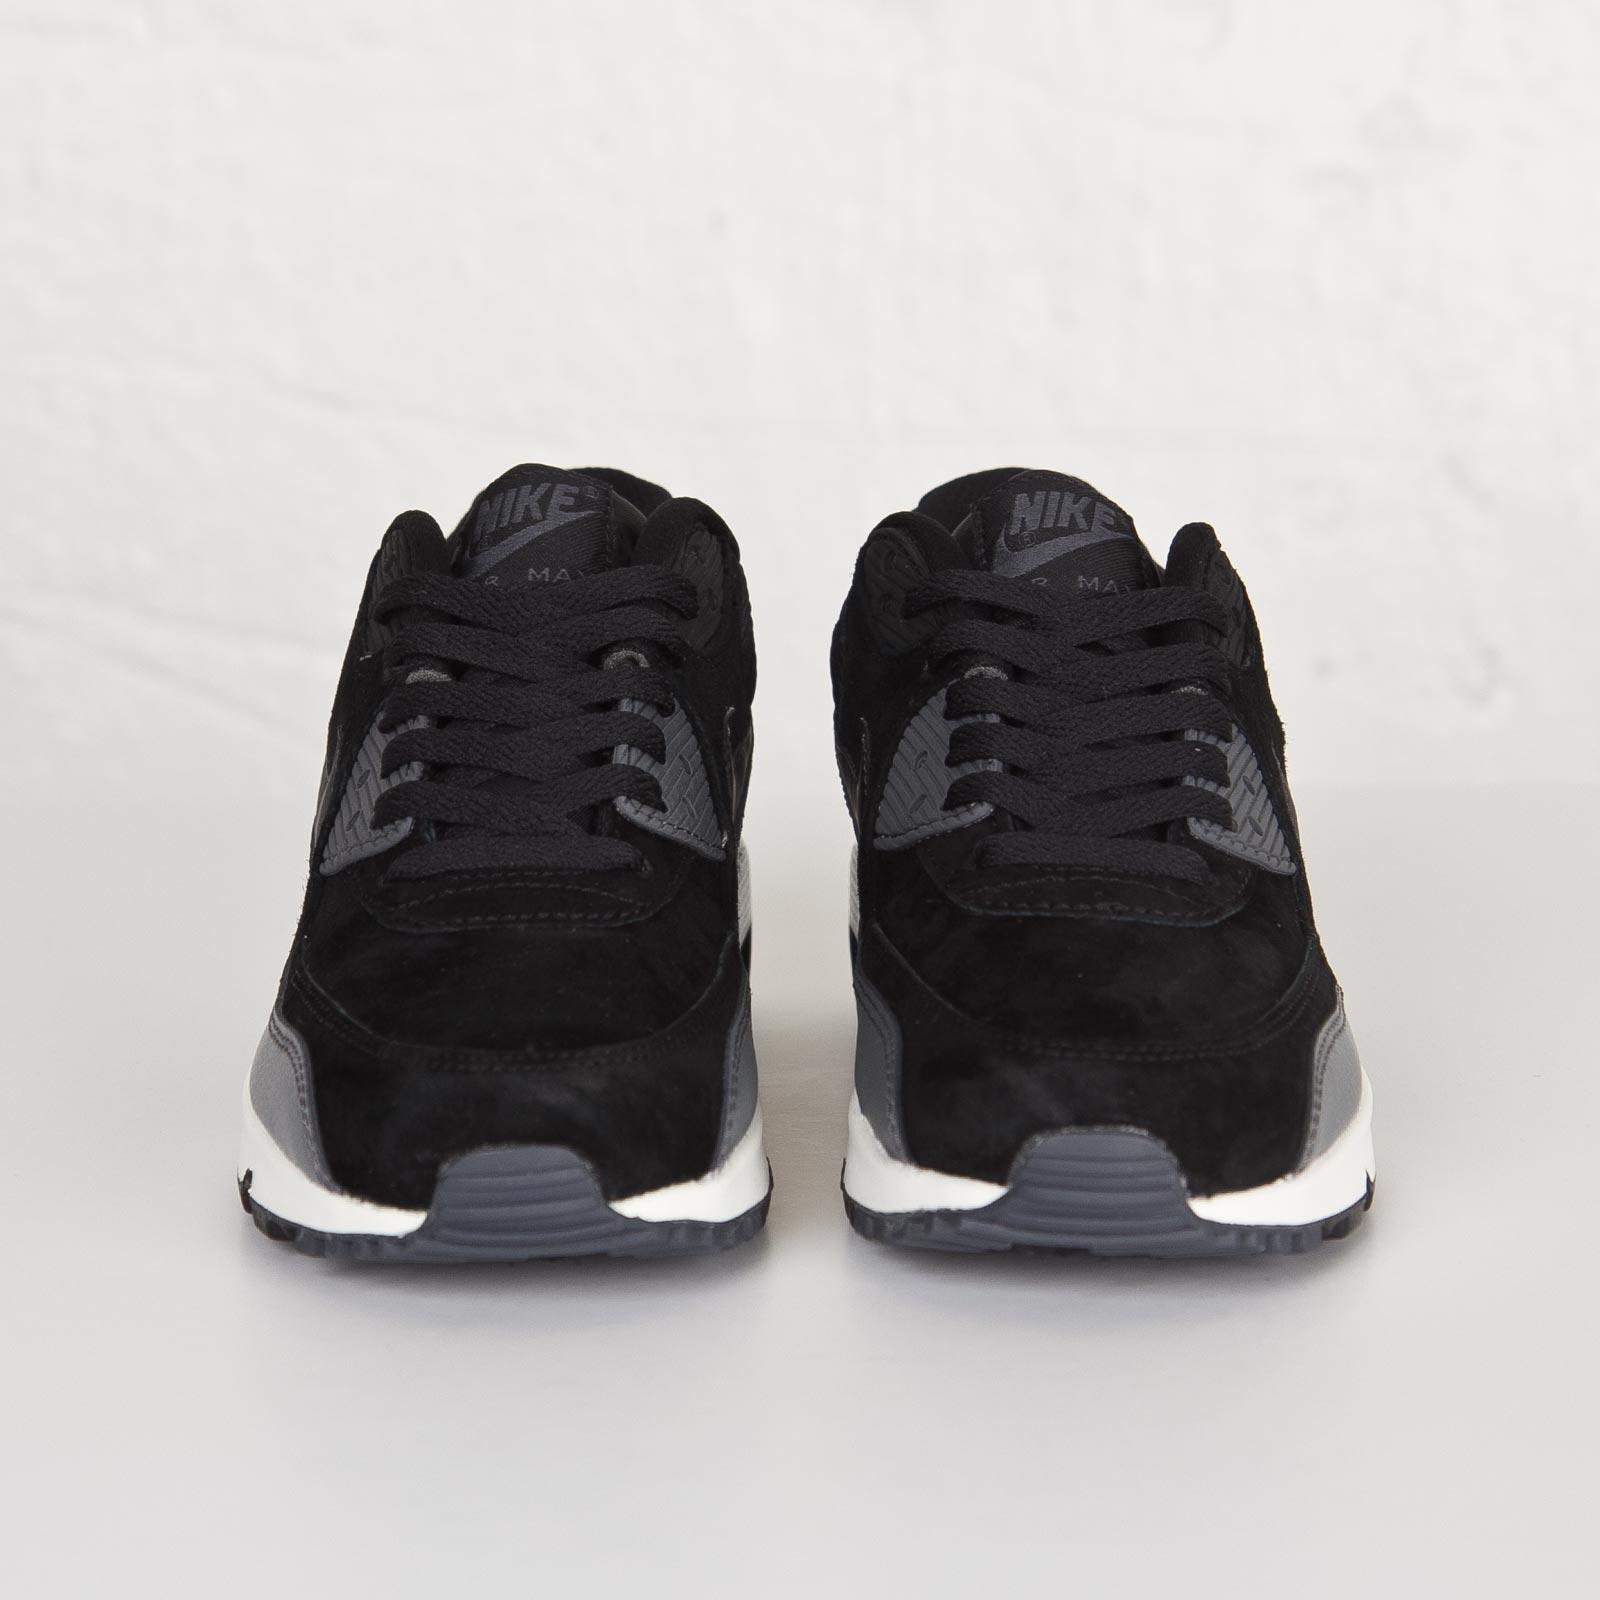 Nike Air Max 90 Leather Black Metallic Hematite Zapatillas